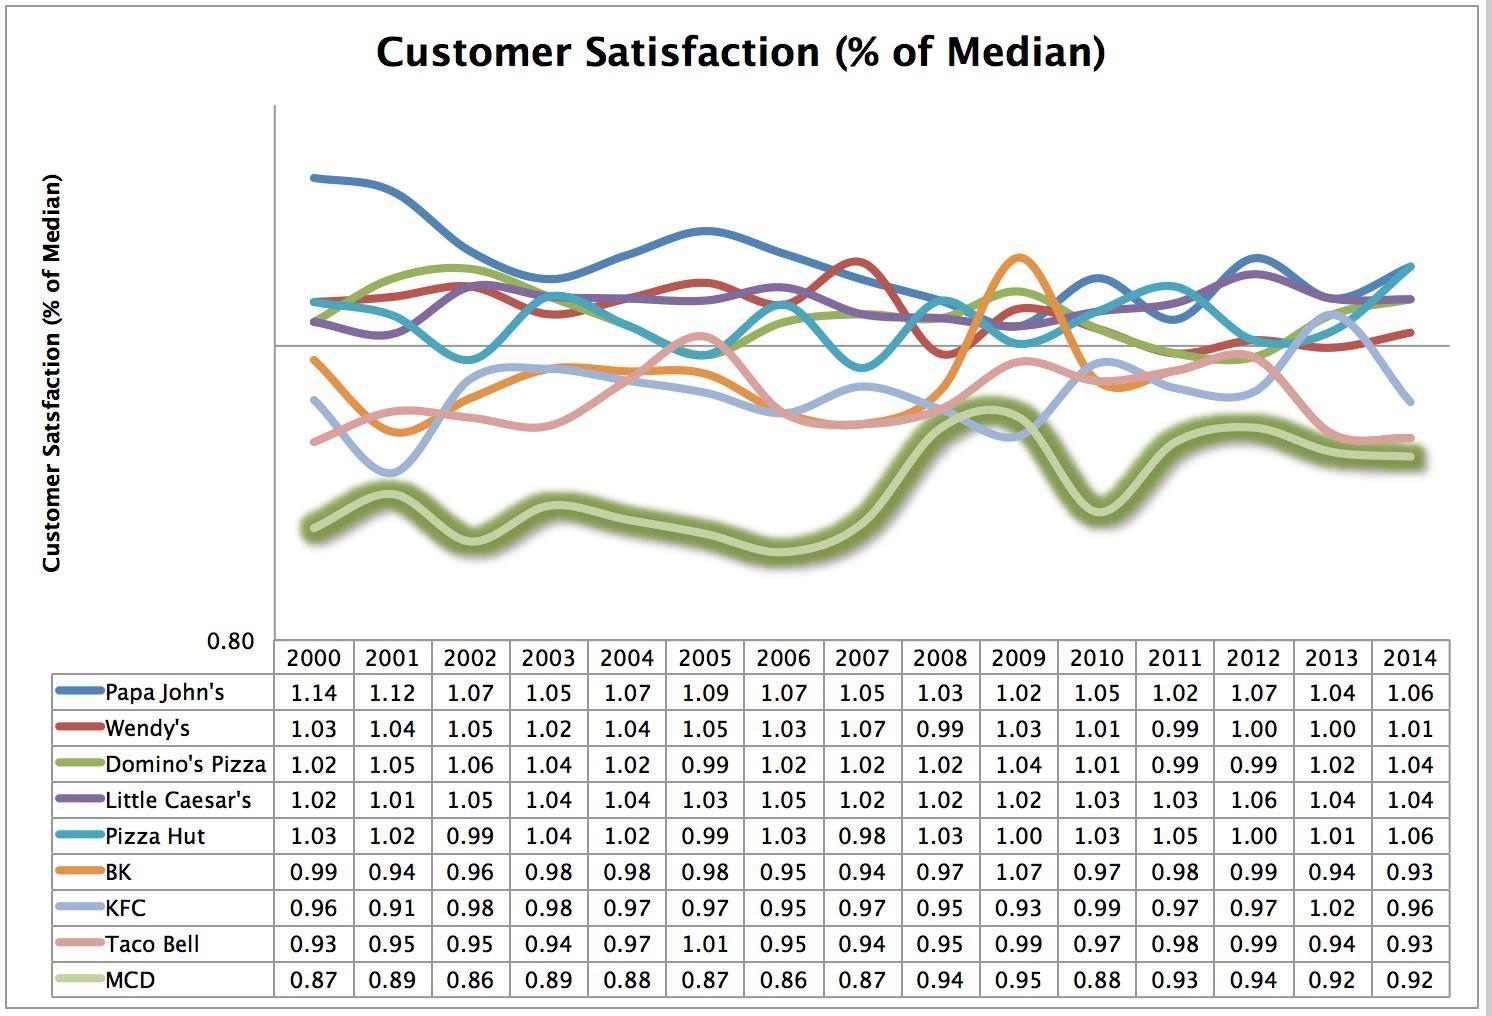 mcd customer satisfaction